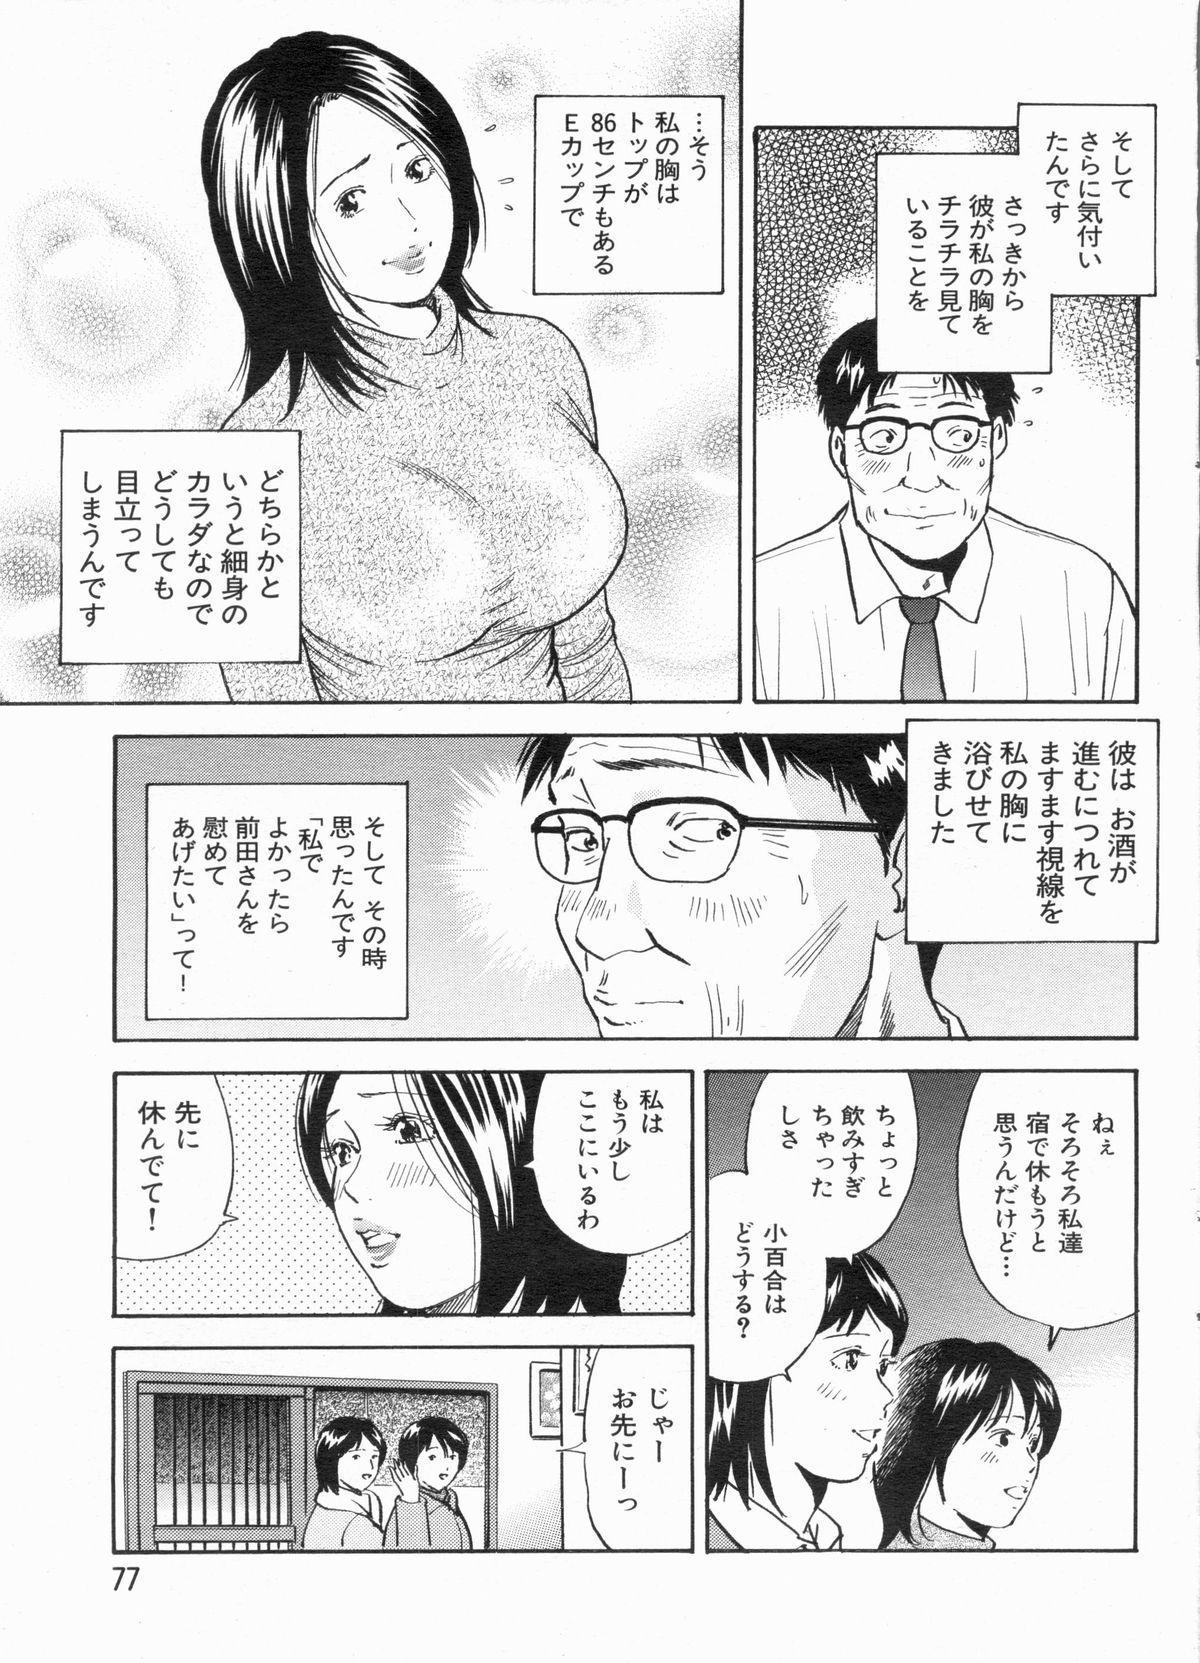 Manga Bon 2013-03 75